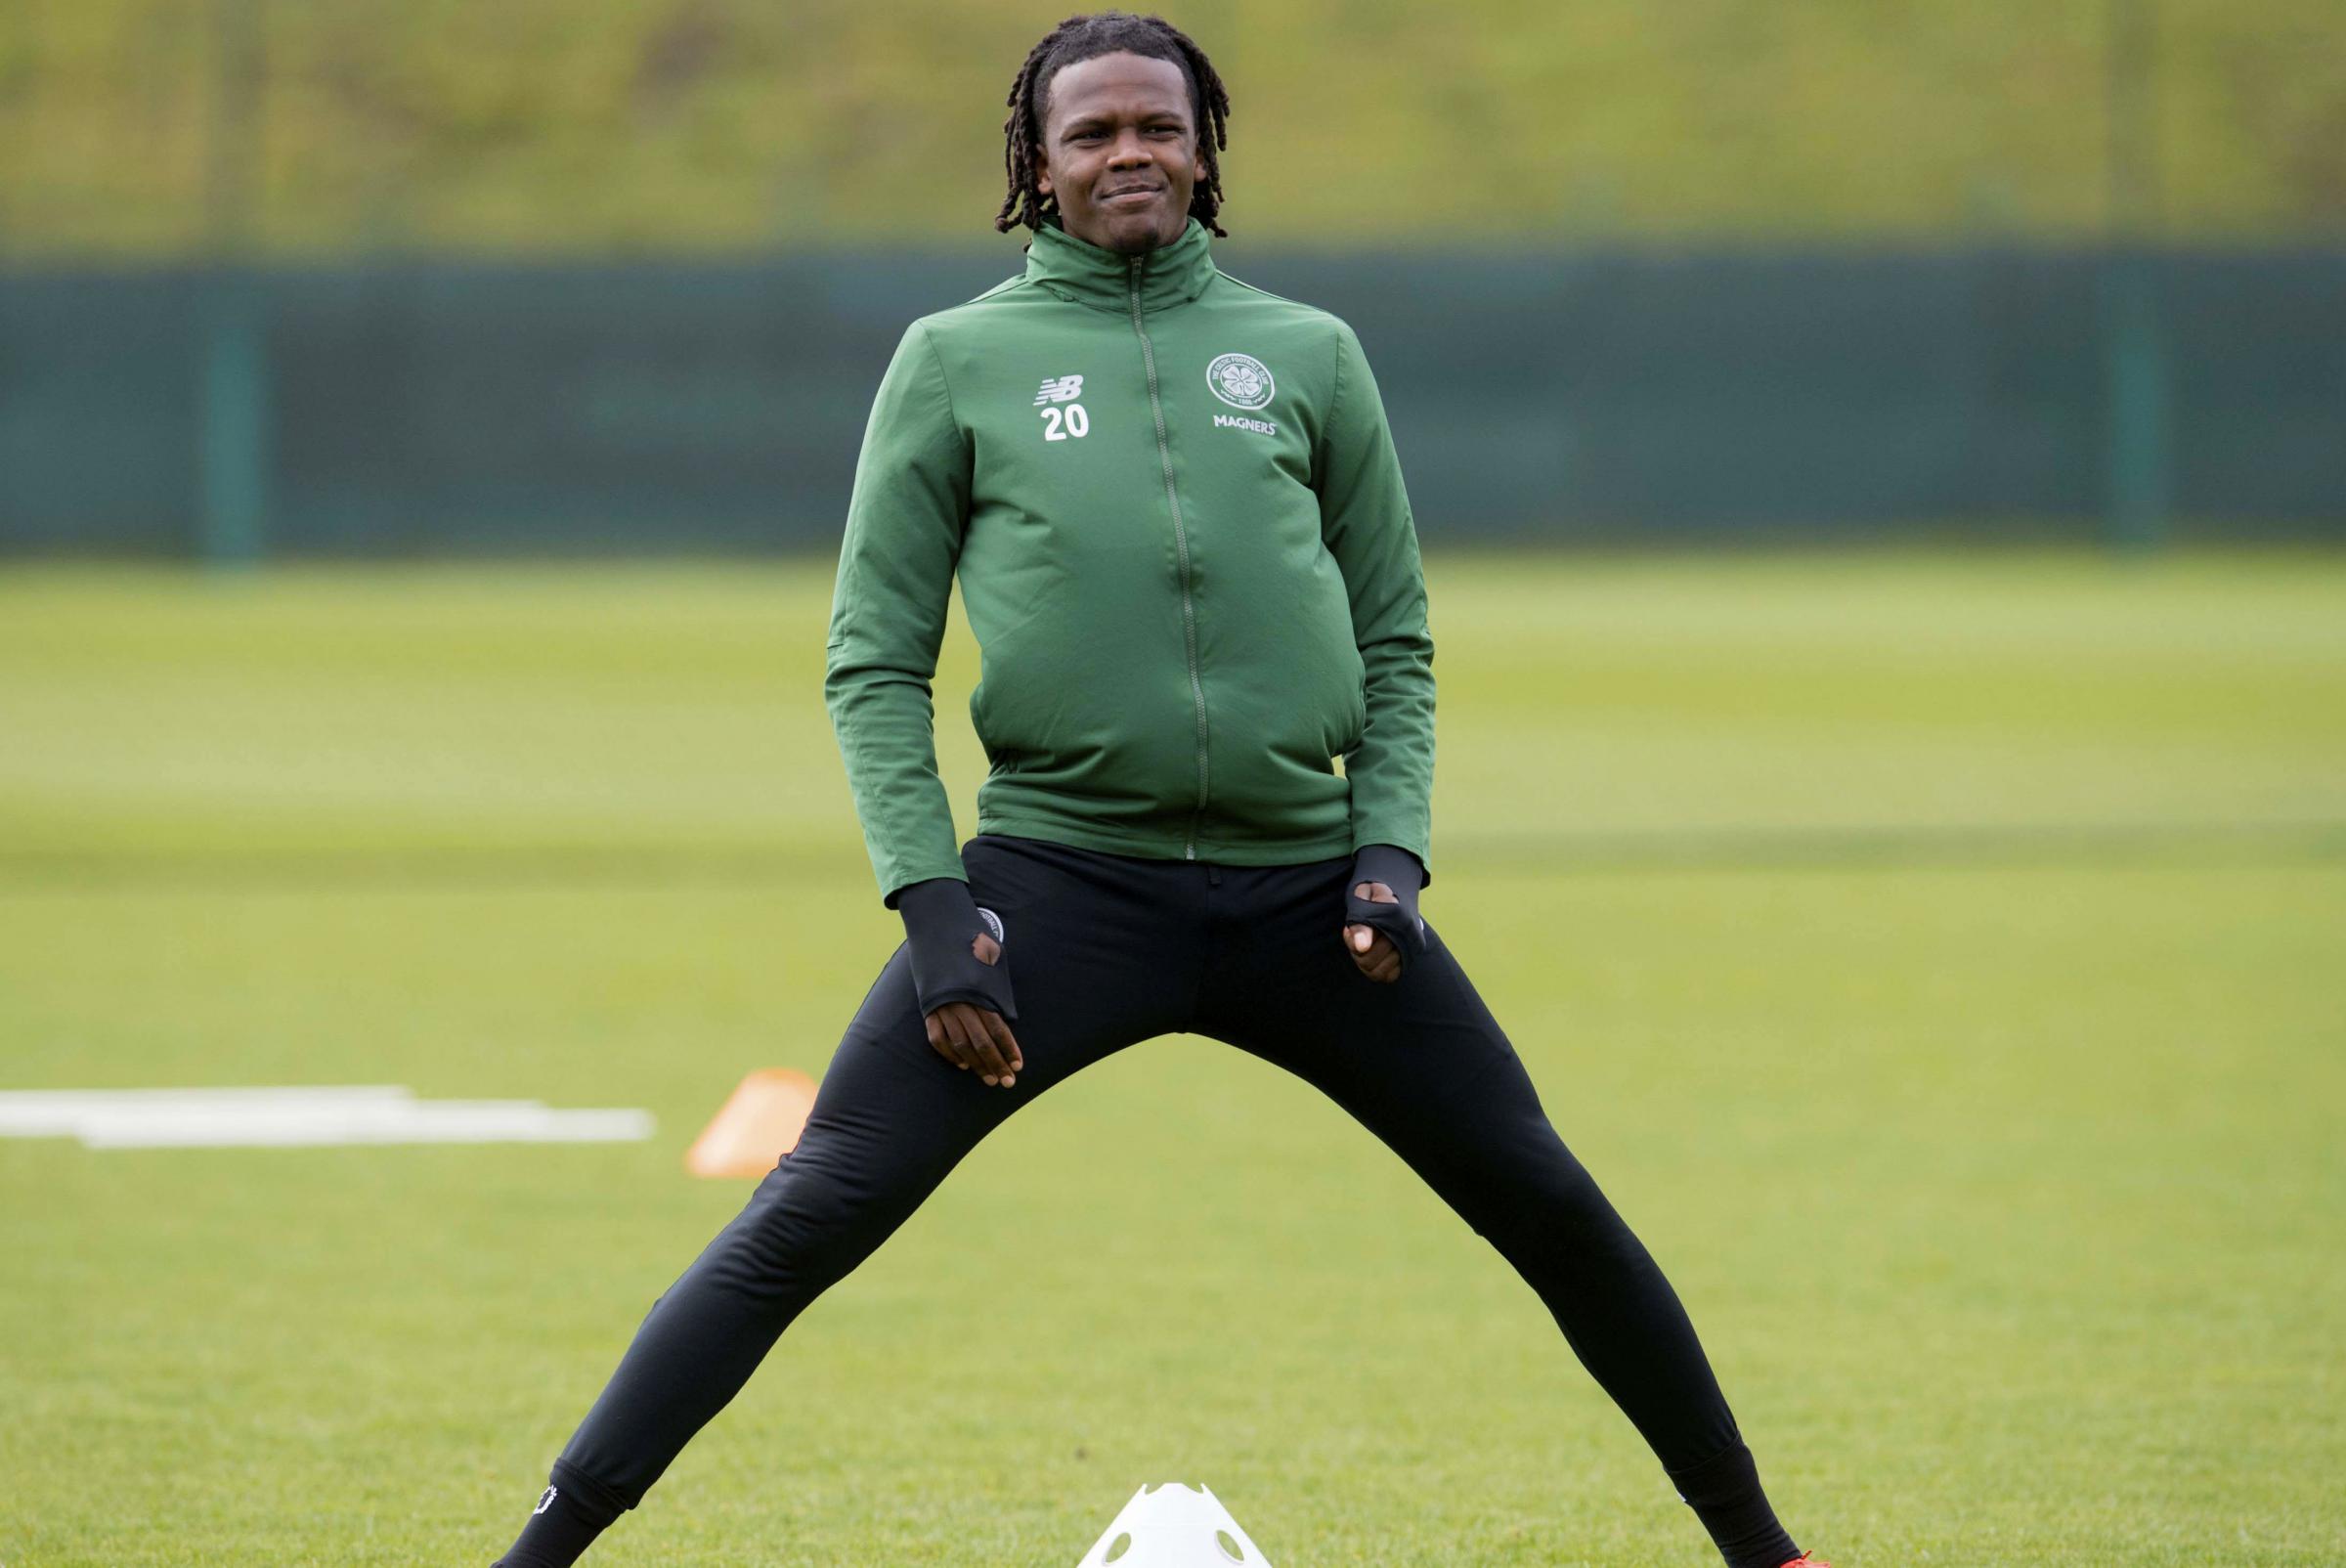 Hertha Berlin confirm Celtic centre half Dedryck Boyata will join them this summer